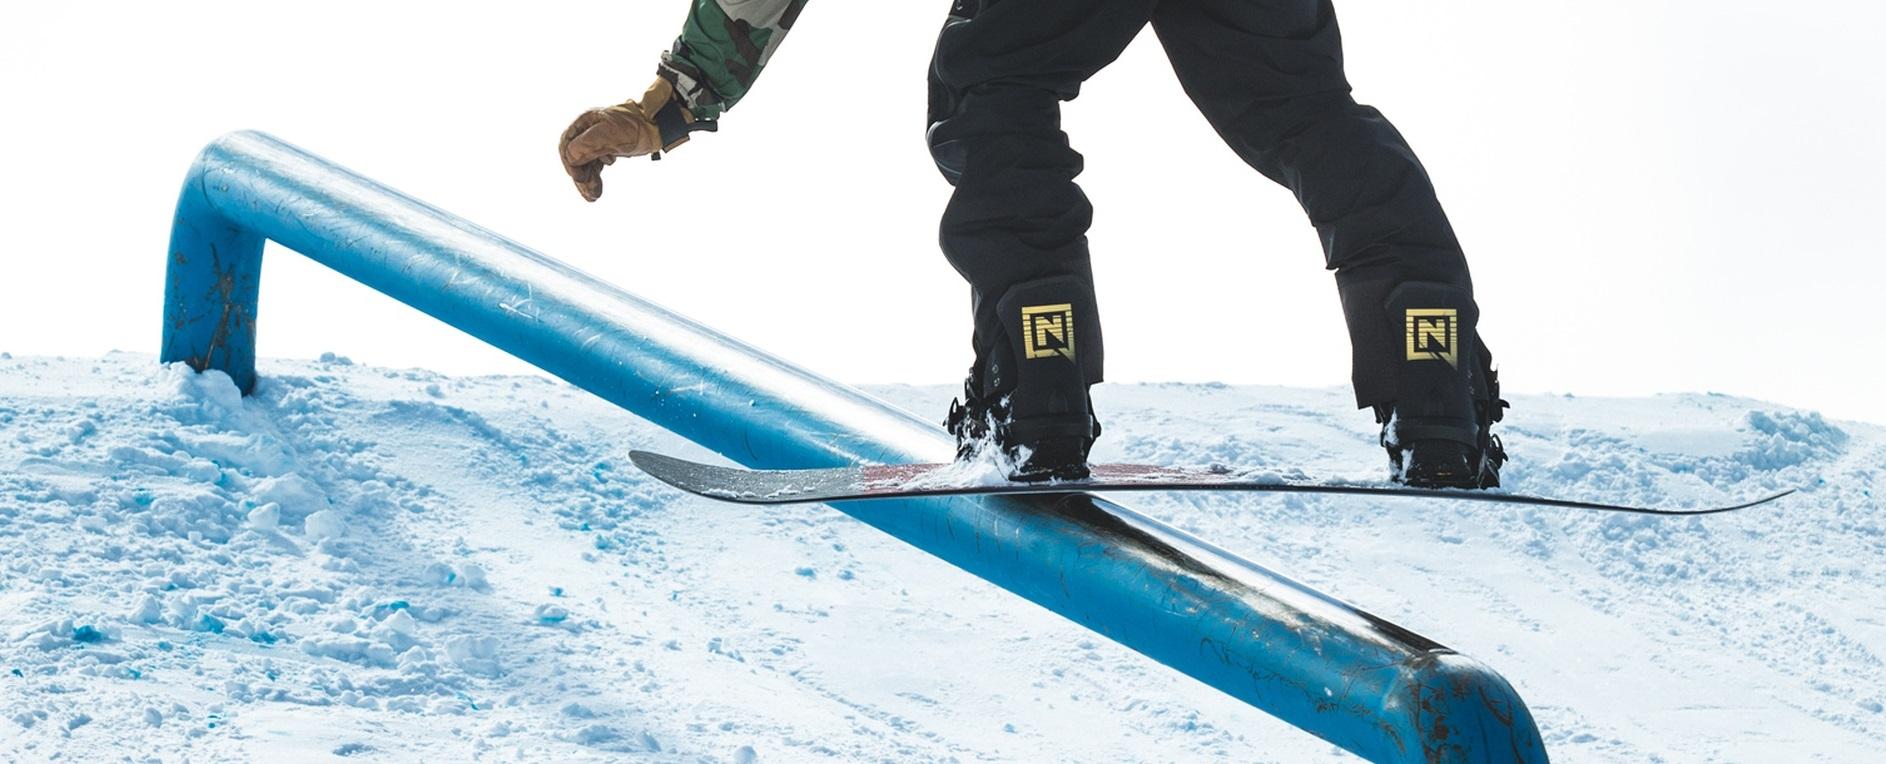 nitro-team-gullwing-2021-exilshop-olomouc-snowboard